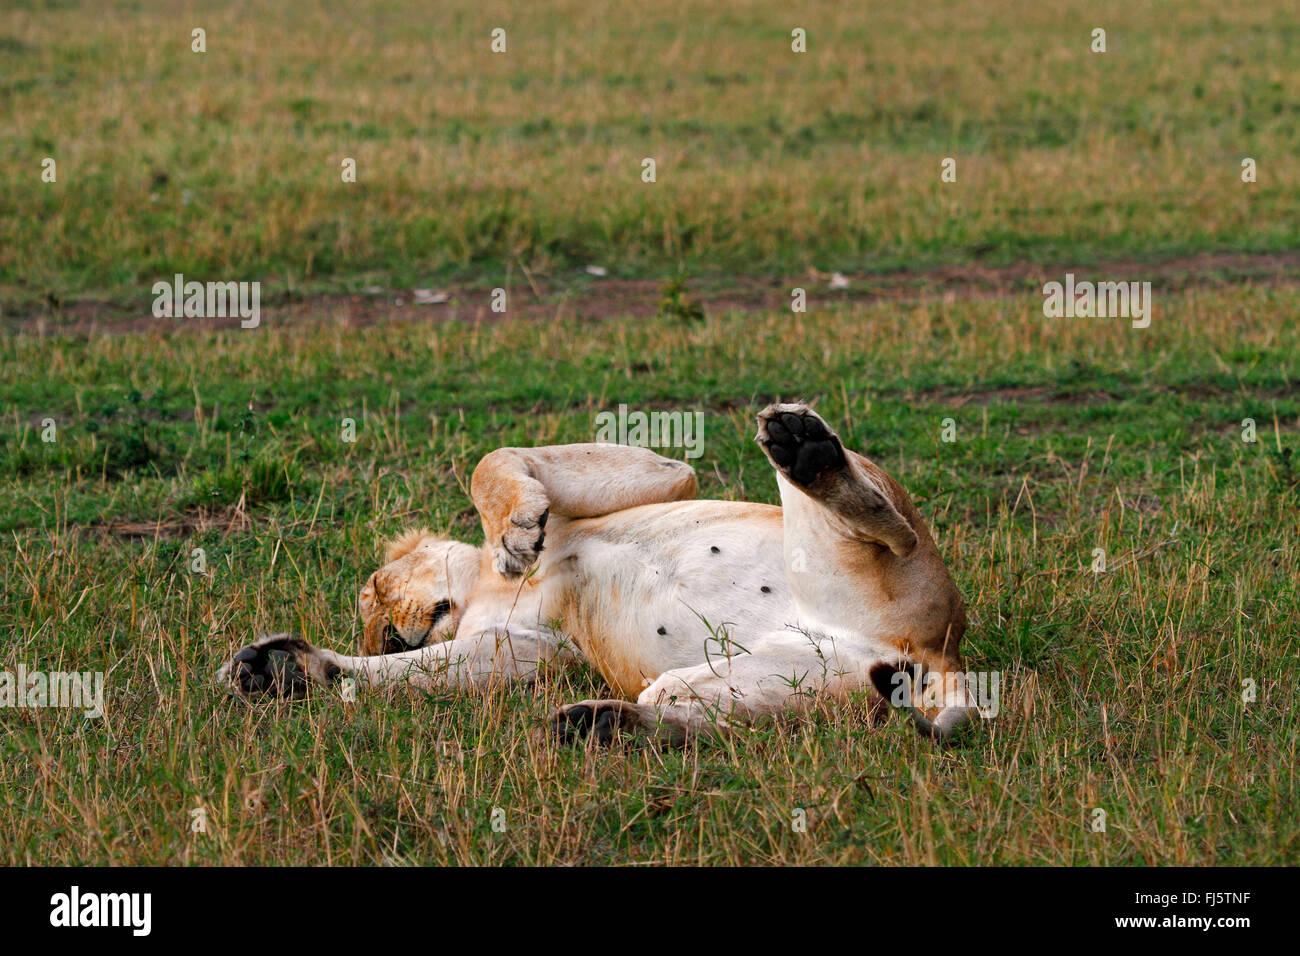 Lion (Panthera leo), Lys in posizione supina dormire, Kenia Masai Mara National Park Foto Stock